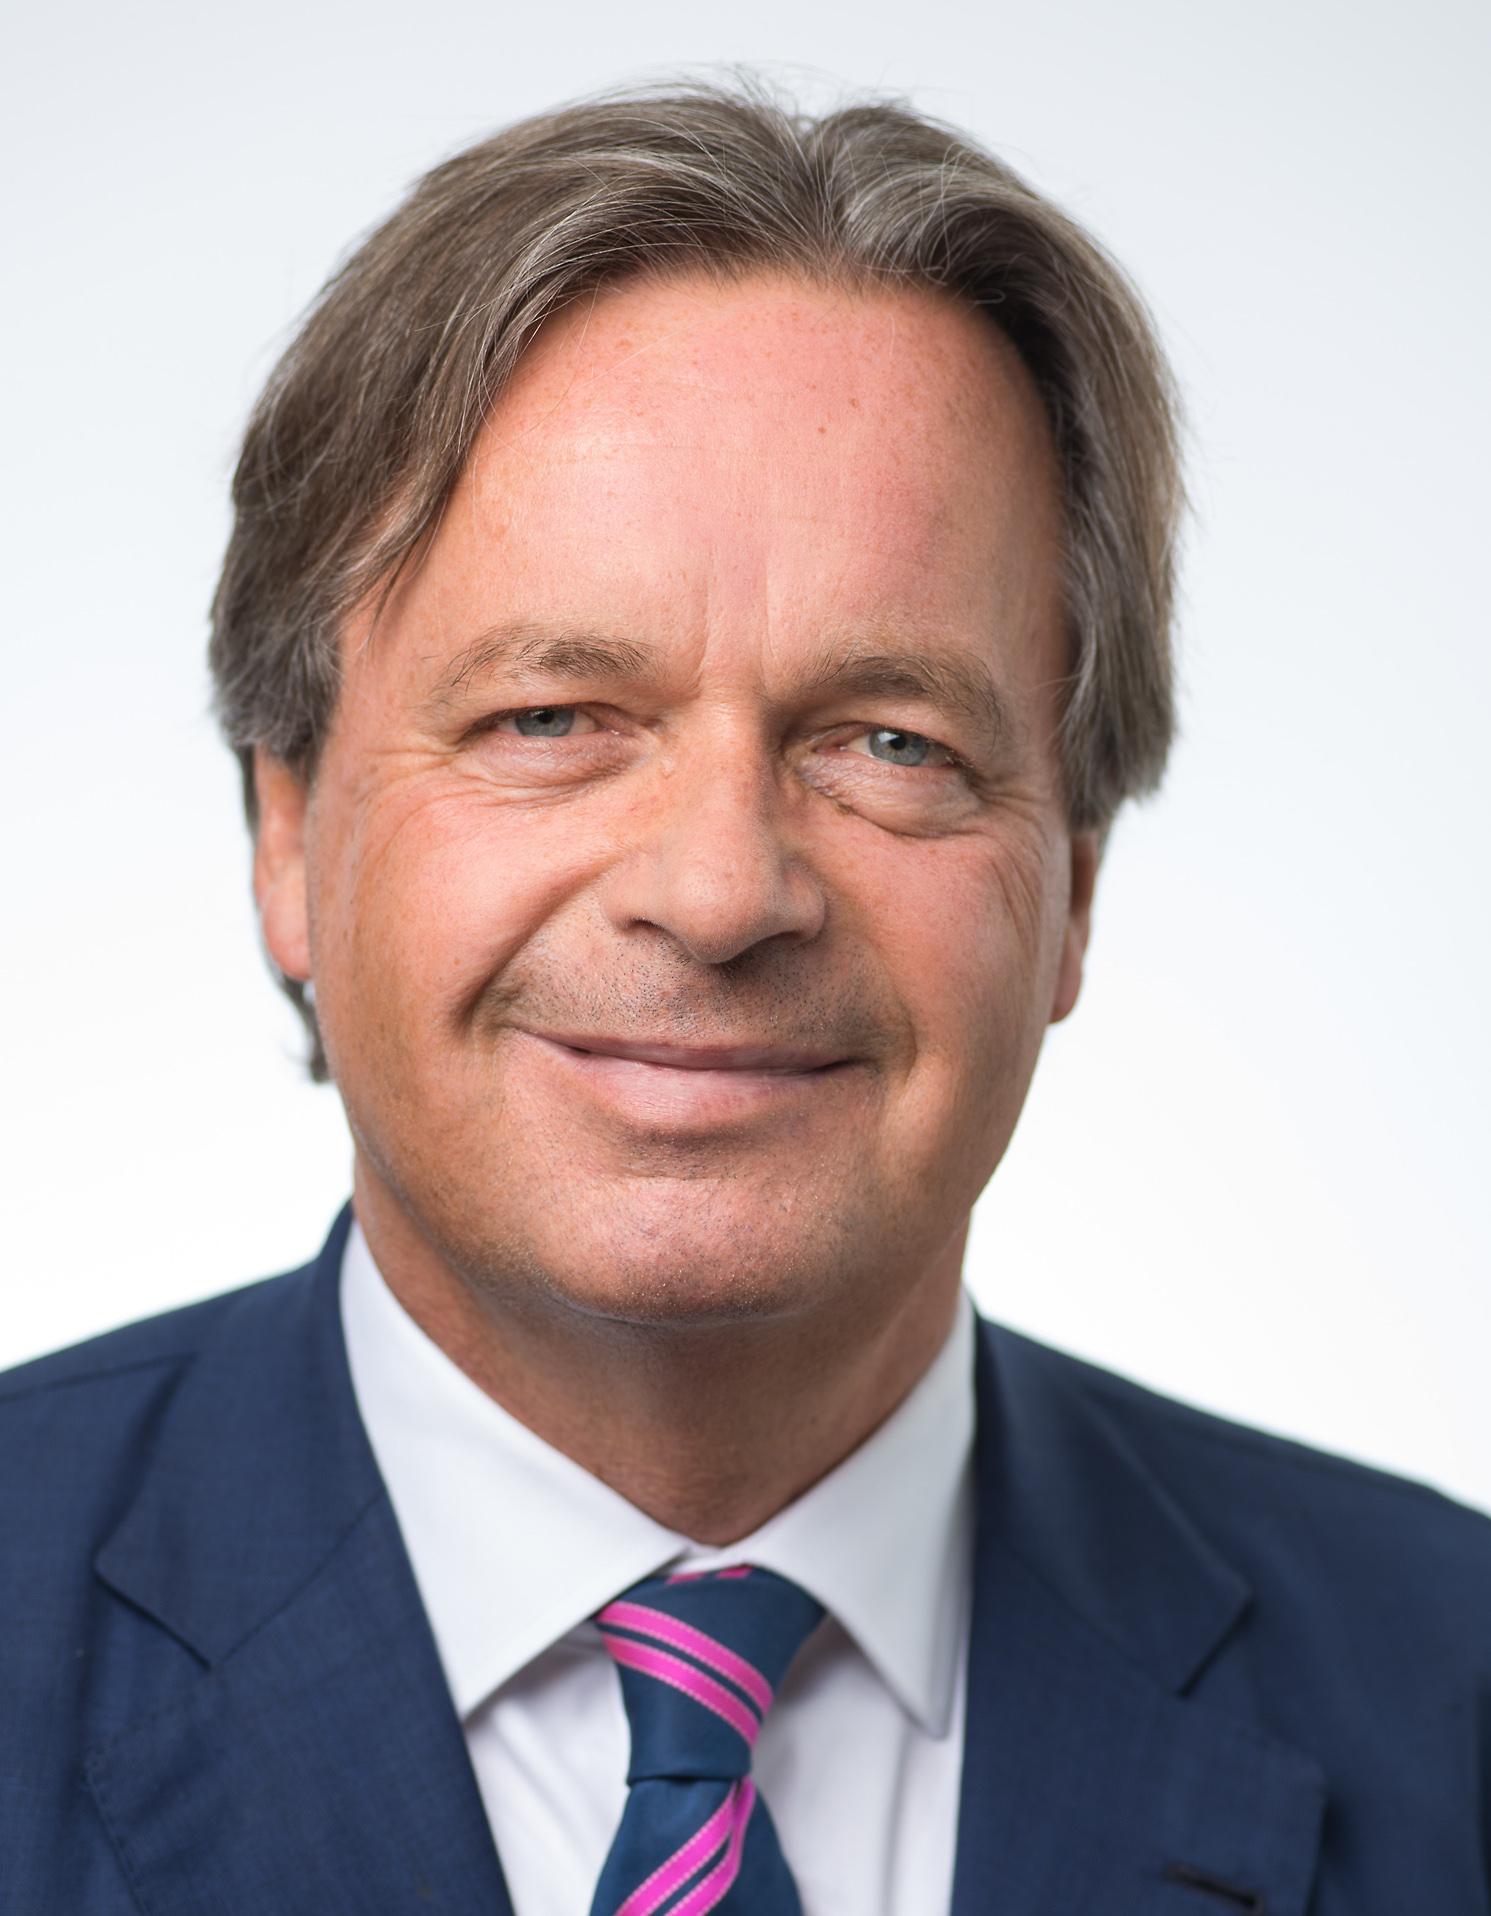 Dr. Andreas Fendel